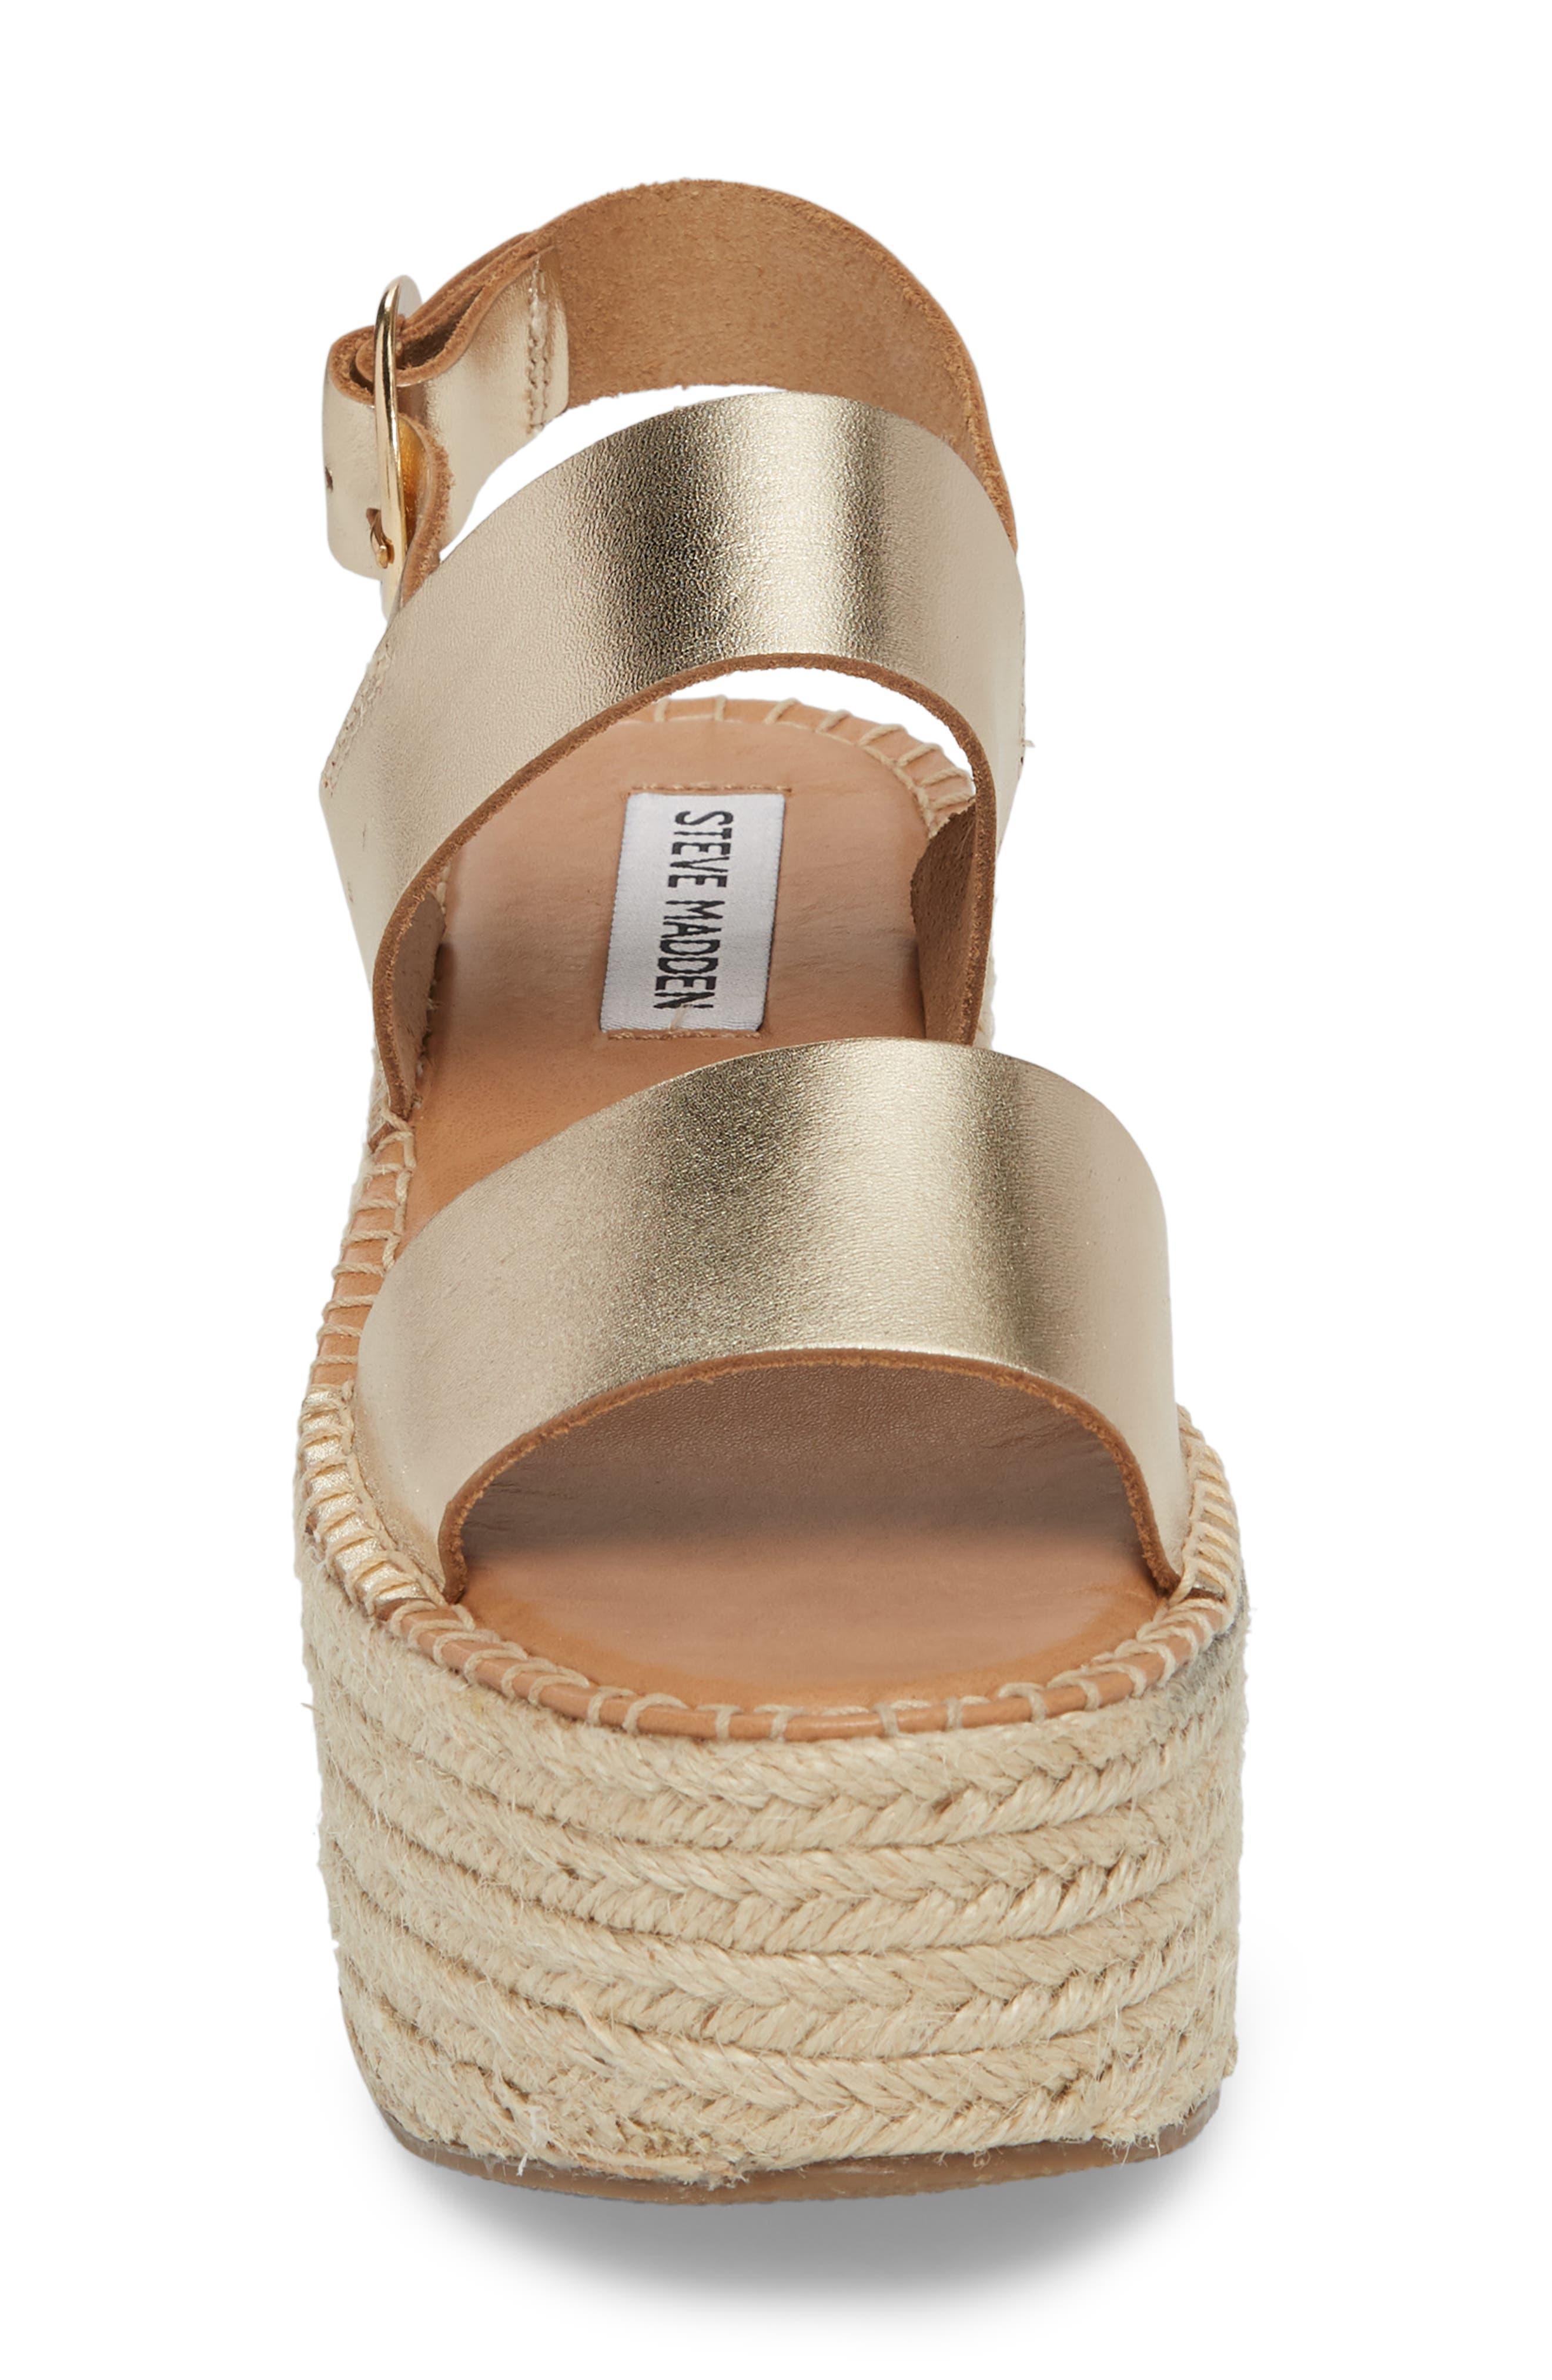 Cali Espadrille Platform Sandal,                             Alternate thumbnail 12, color,